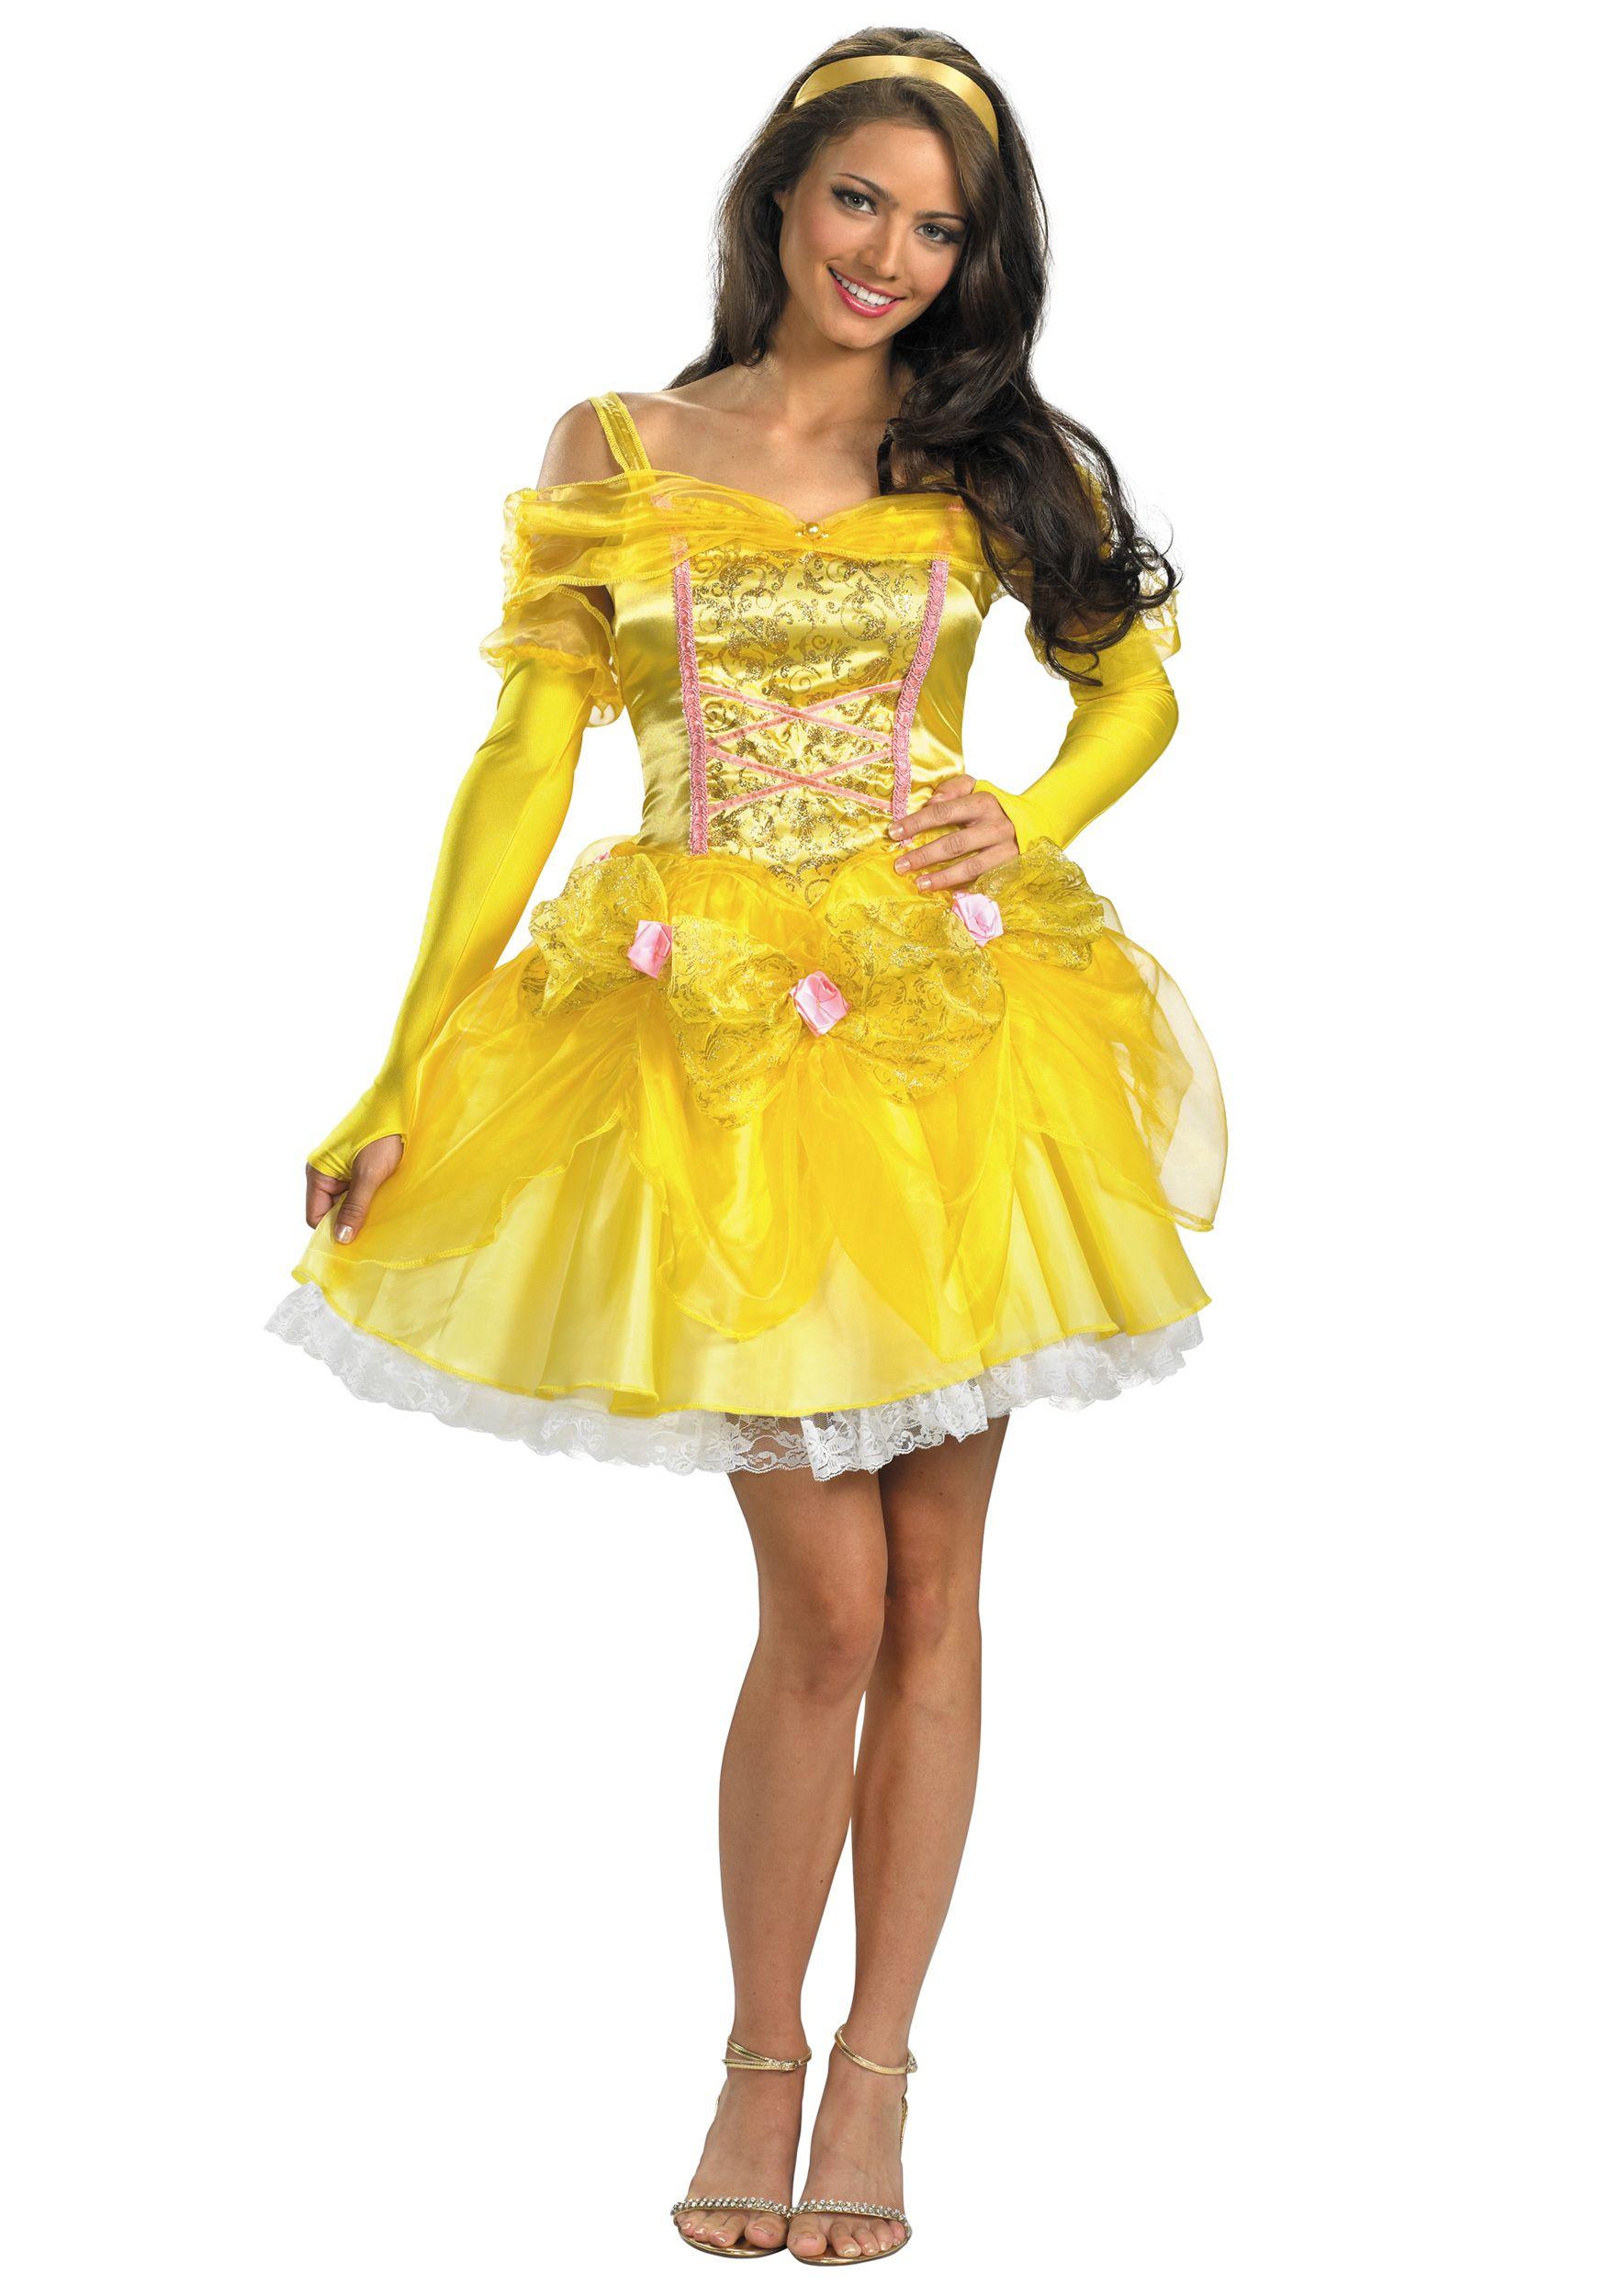 Sexy Princess Belle Costume  sc 1 st  Pinterest & Sexy Princess Belle Costume | Halloween | Pinterest | Princess belle ...